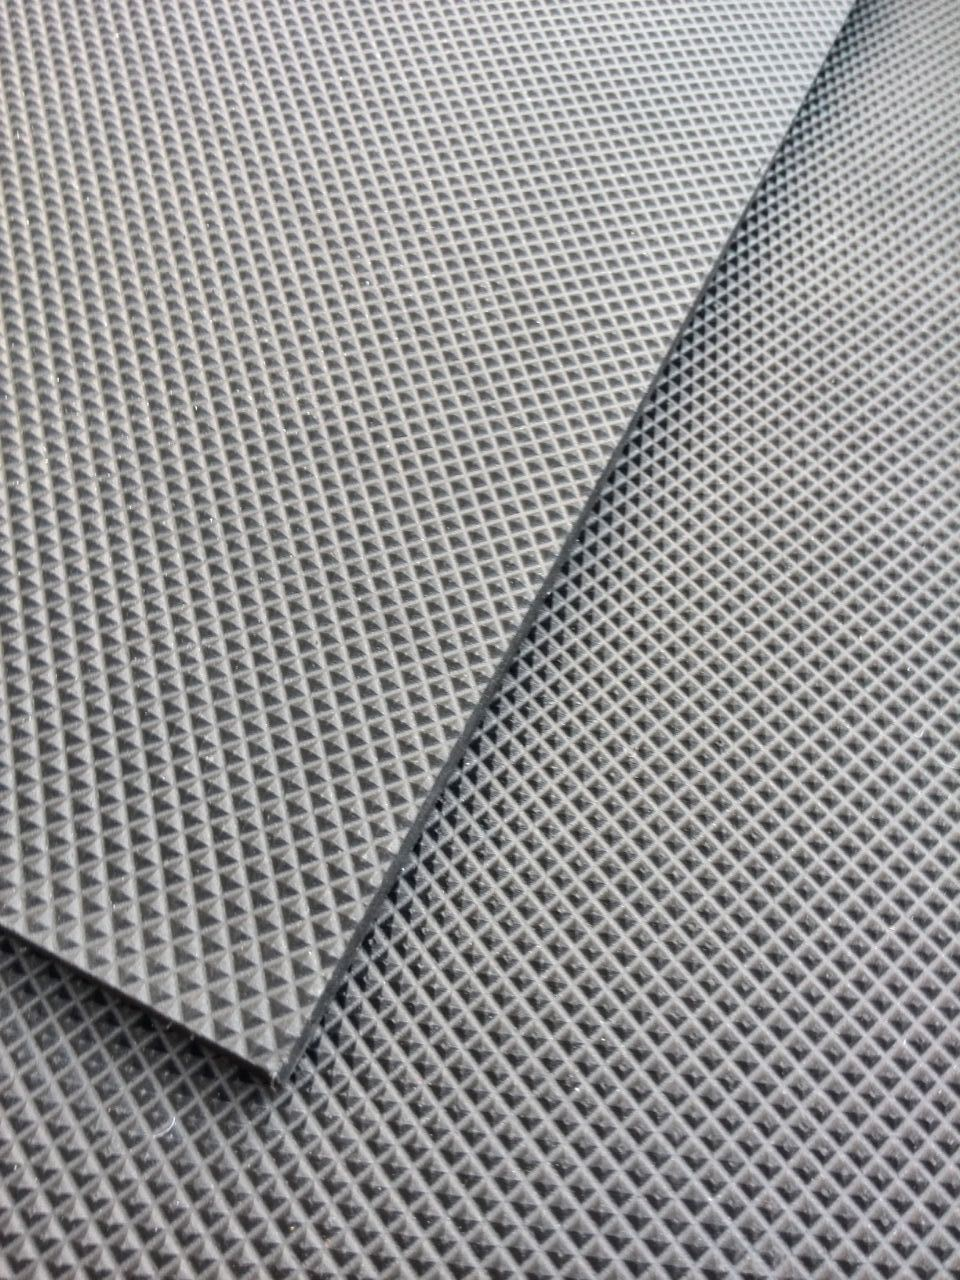 EVA Rubber Sheets for Slipper Shoe Sole Shoe Outsole